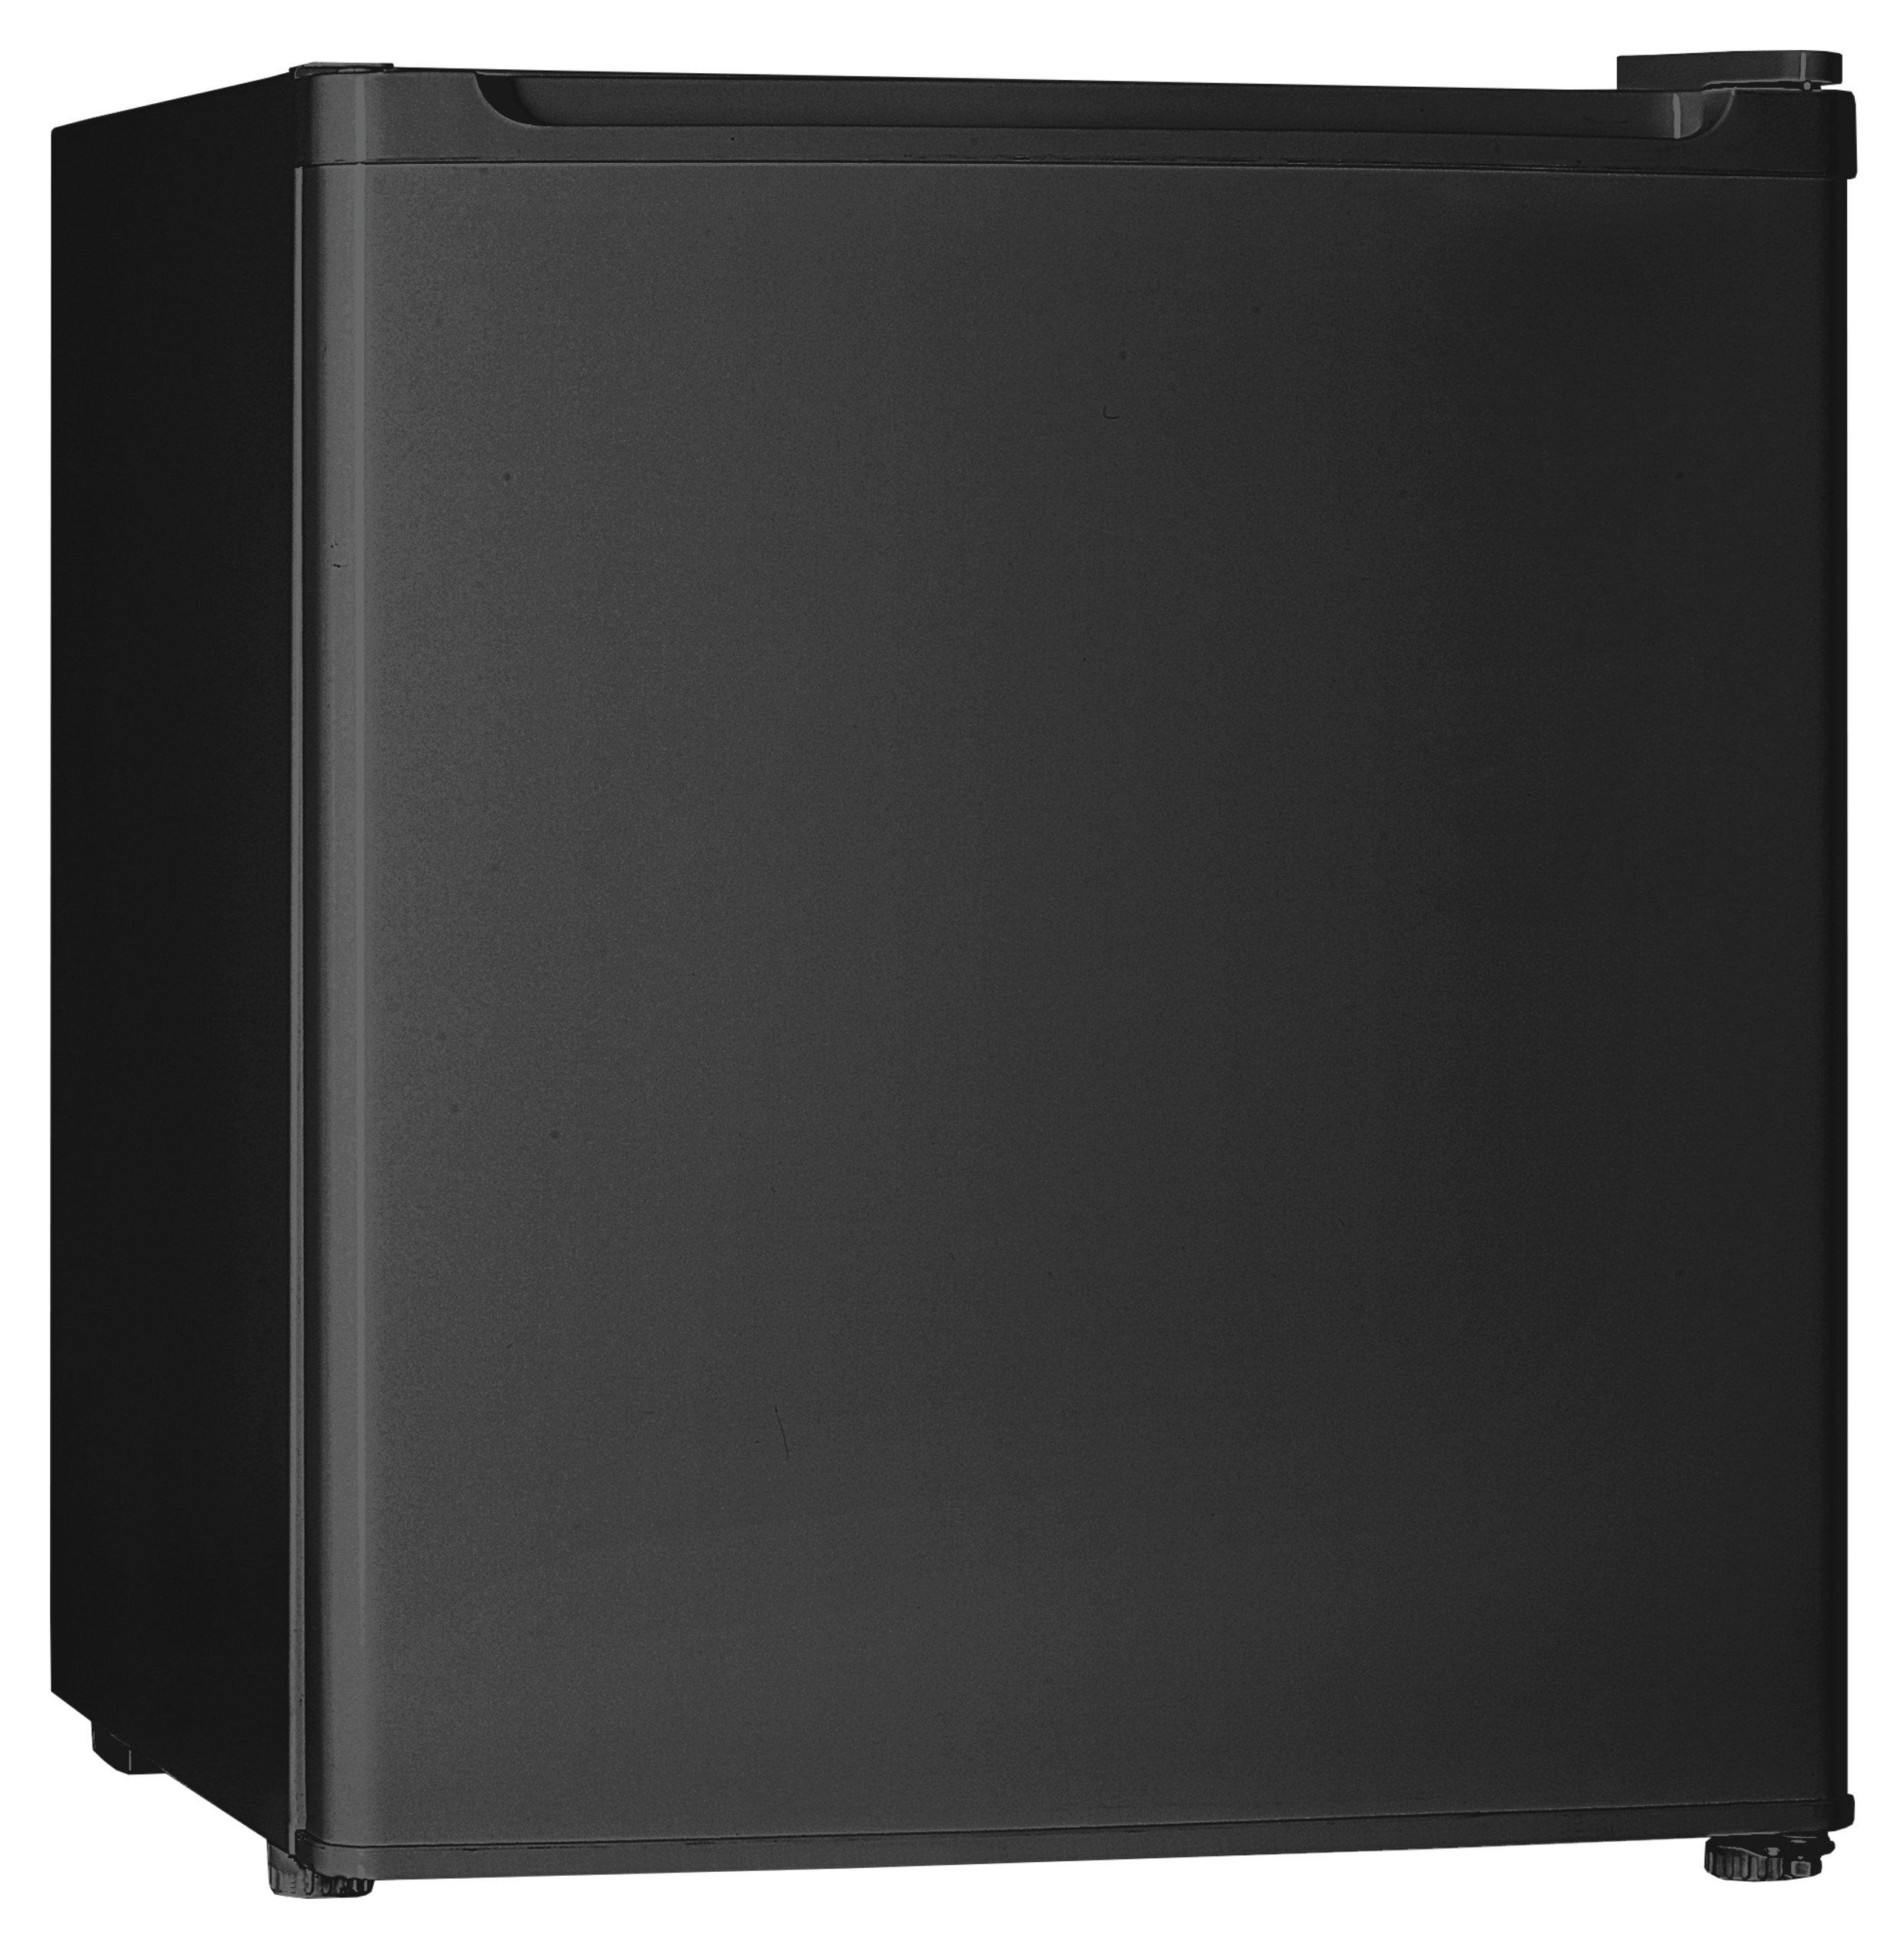 Simple Value 38 Litre Tabletop Fridge - Black/Store Pick Up